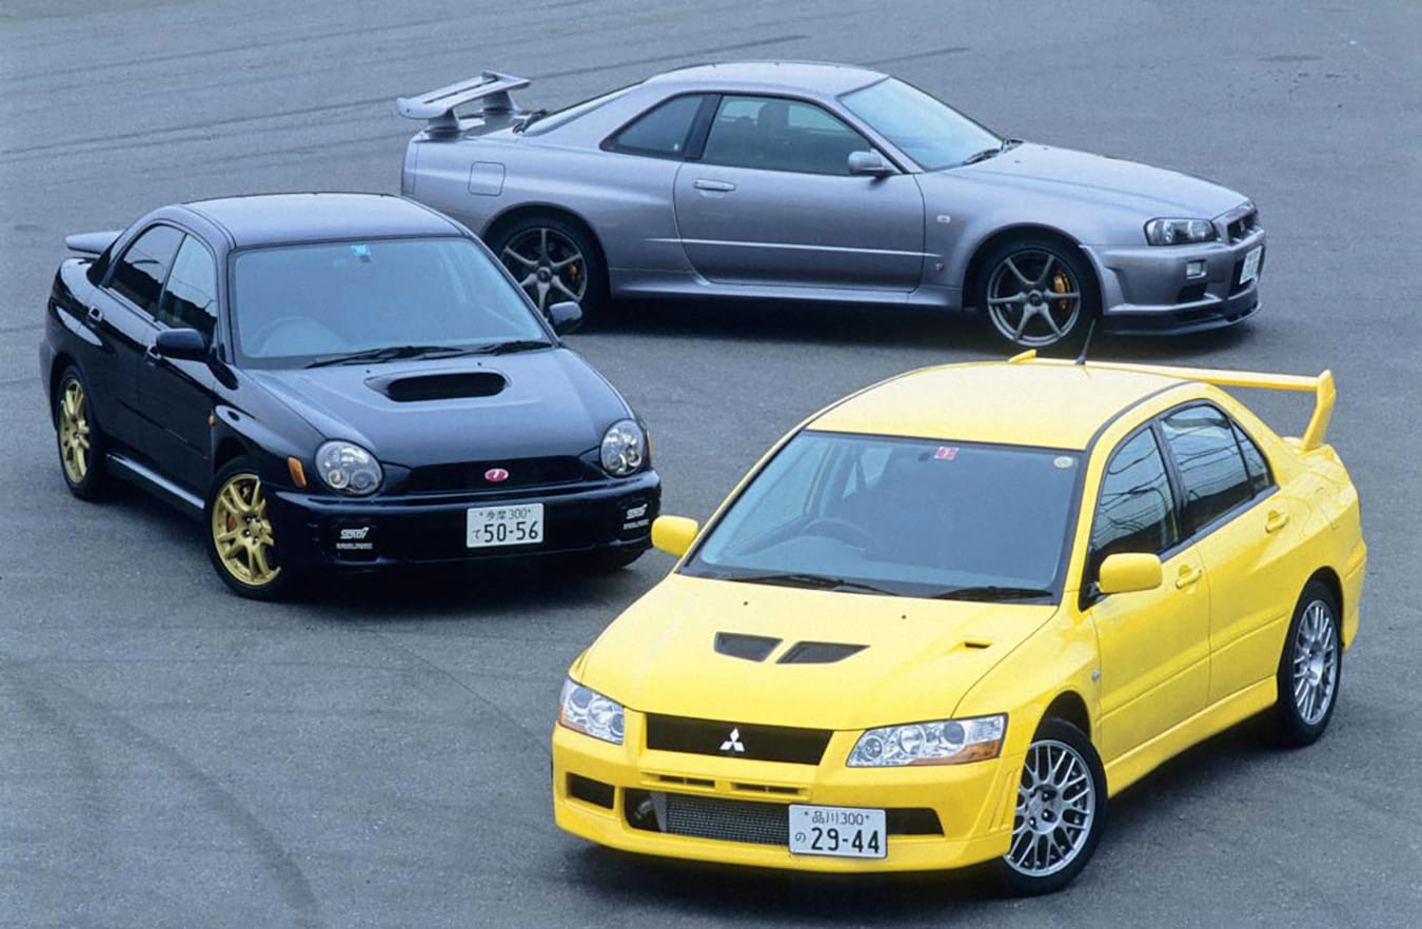 Mitsubishi Lancer Evolution Vii Nissan Skyline Subaru Impreza Wrx Web Jpg